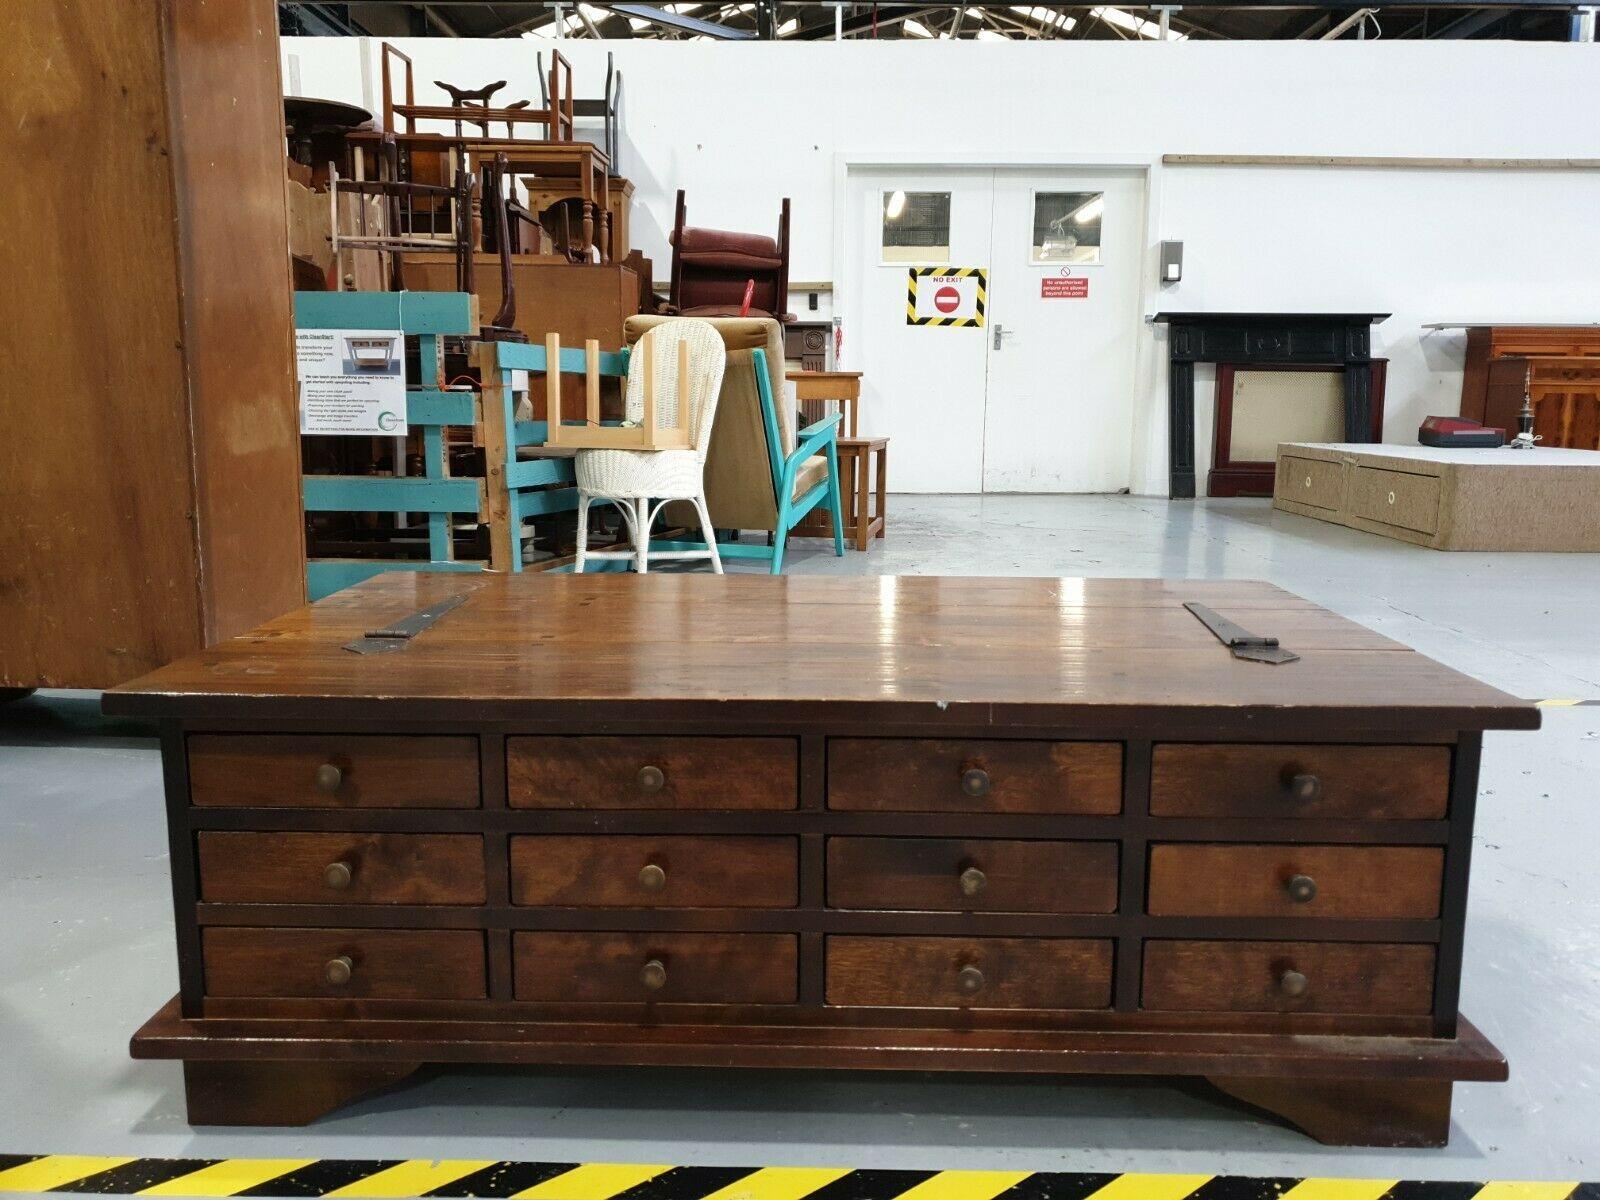 Large Vintage Retro Storage Cabinet Coffee Table Sideboard Sofa Table Ottoman Ebay Coffee Table And Sideboard Vintage Sideboard Ottoman Table [ 1200 x 1600 Pixel ]